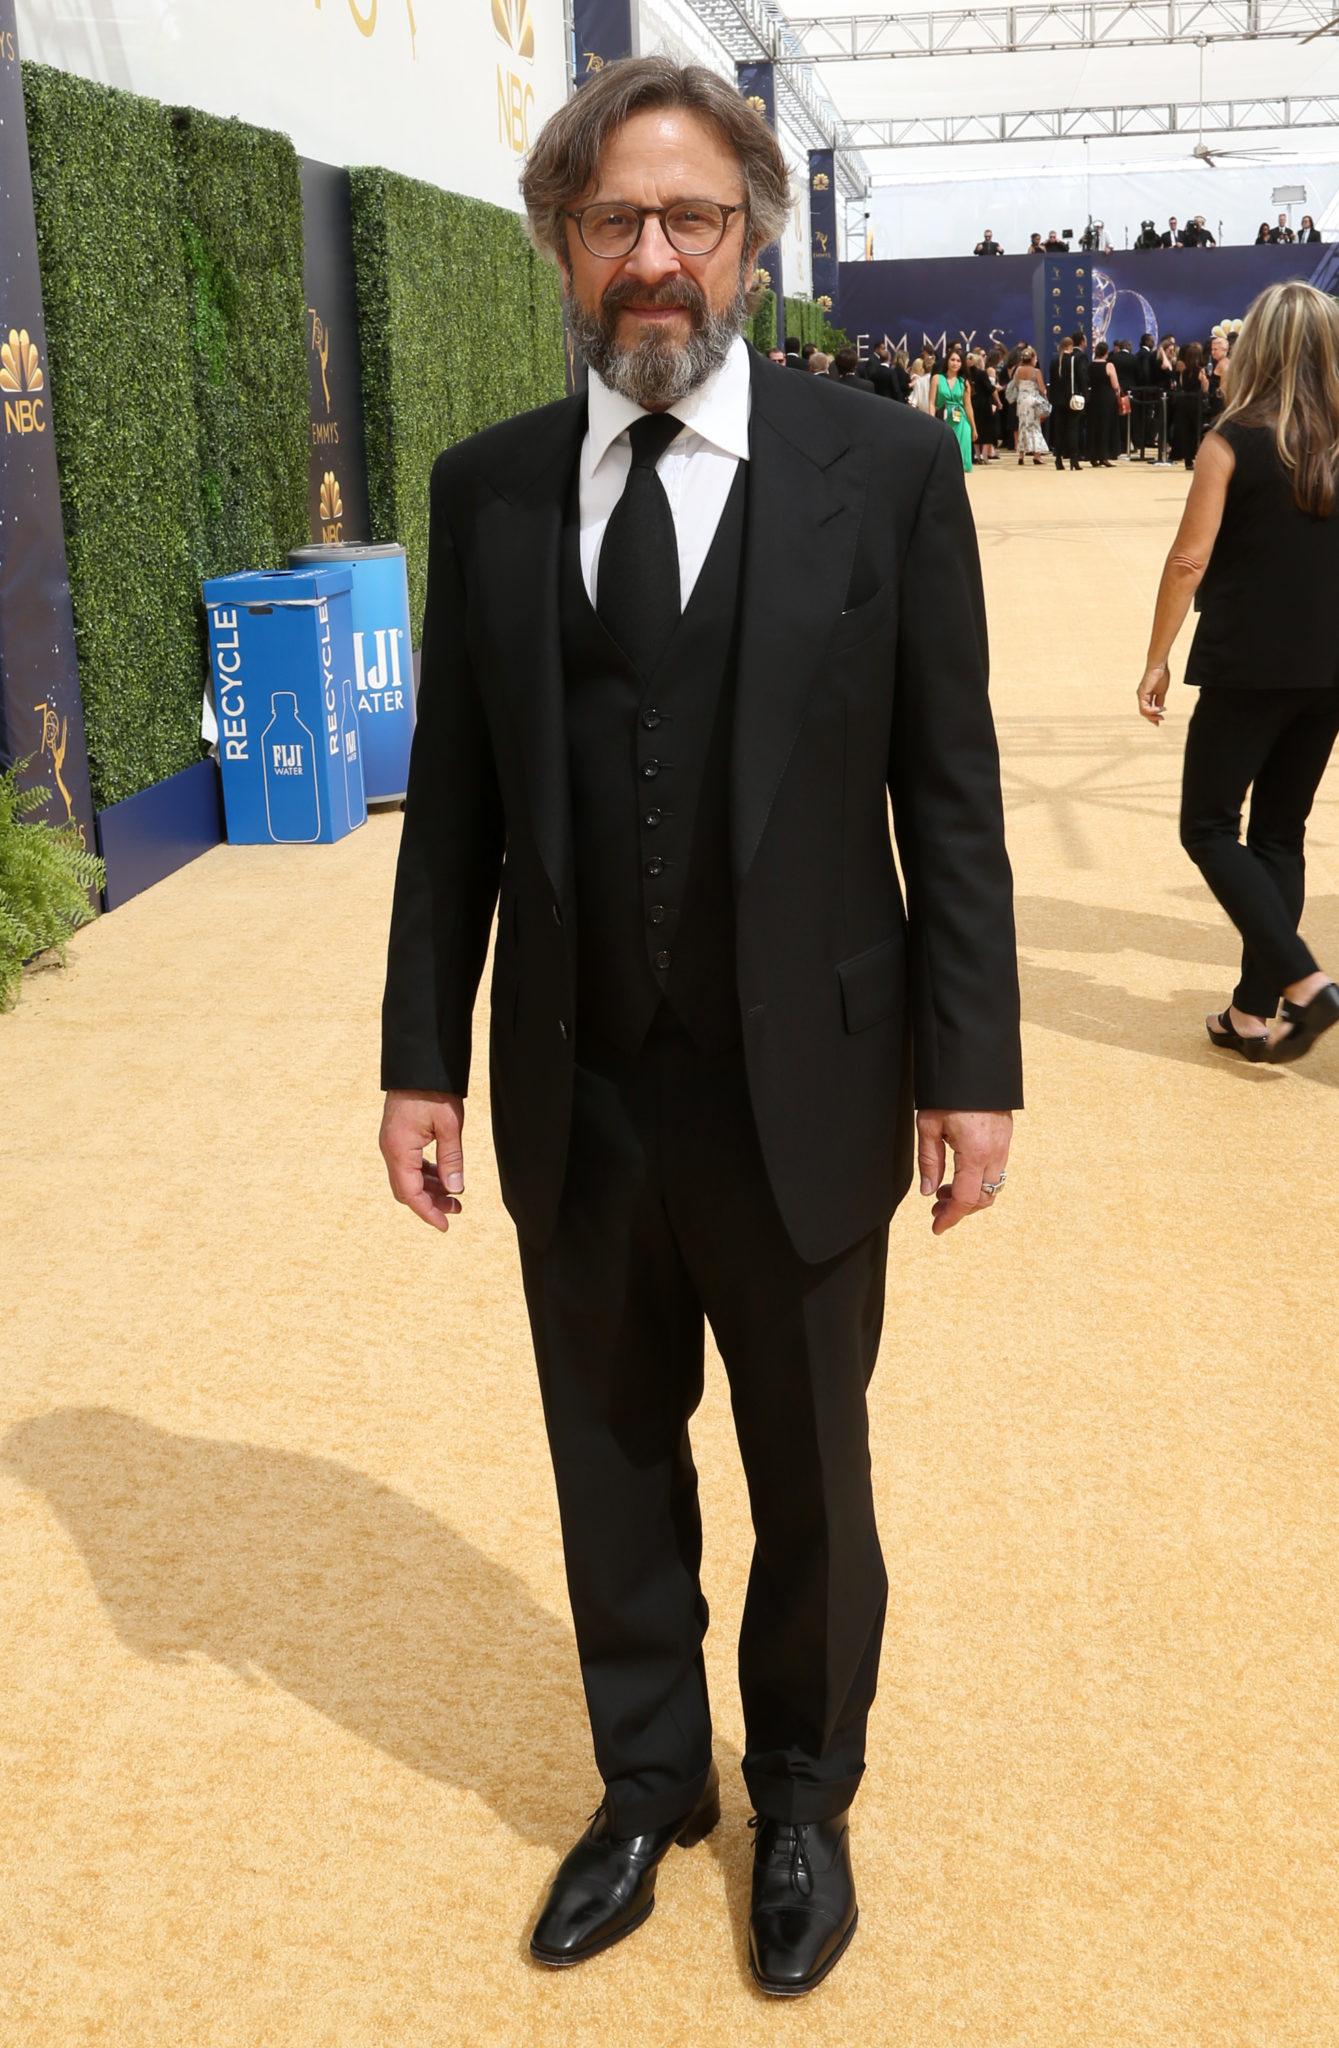 Marc Maron Emmys 4Chion Lifestyle